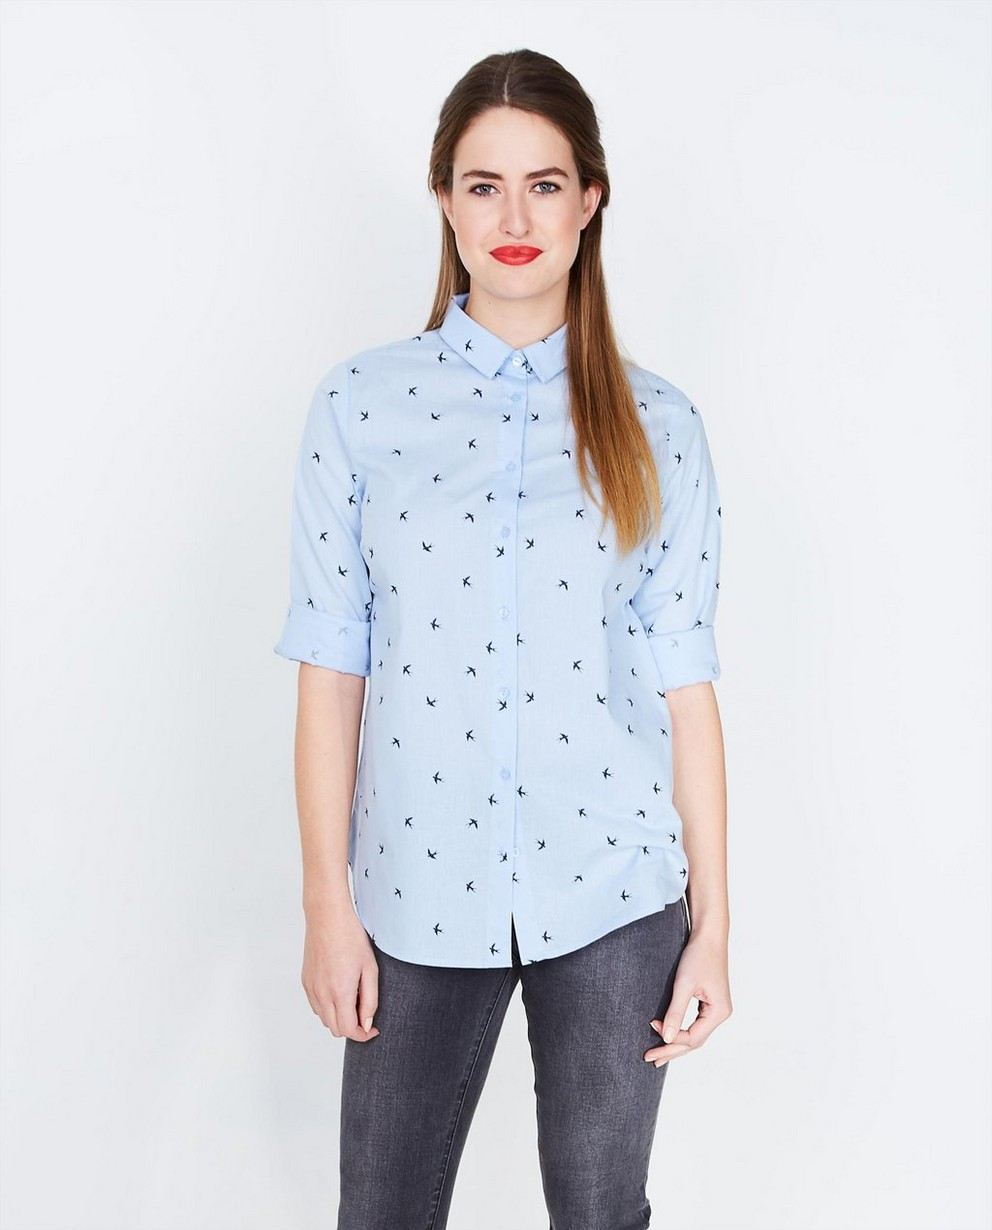 Hemden - ASM - Hemelsblauw hemd